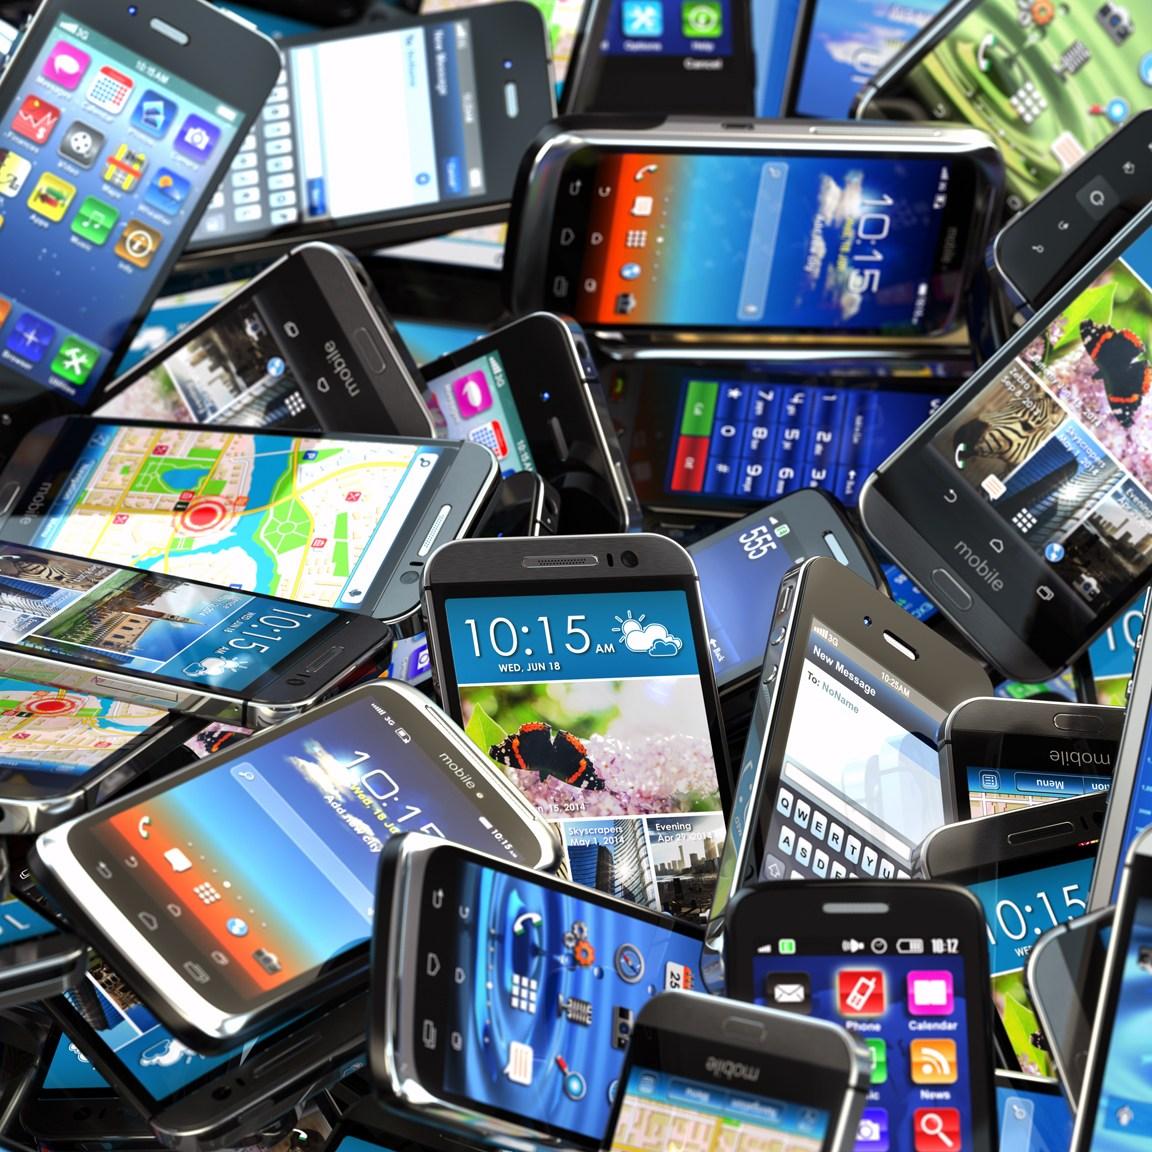 Best smartphones of 2016: The 25 best mobile phones you can buy today